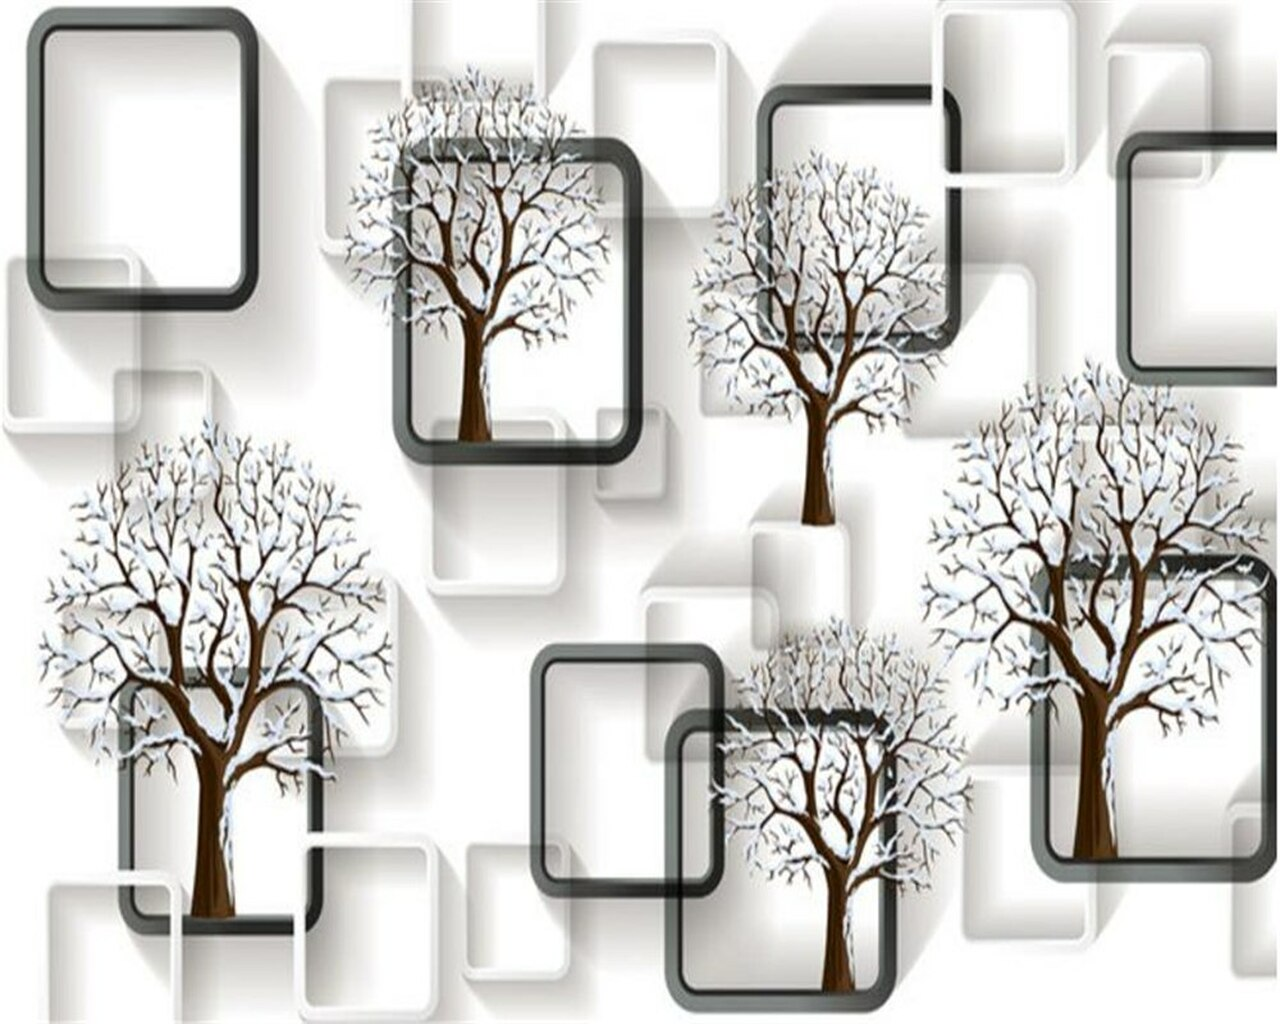 Beibehang Custom Wallpaper Black And White Grid 3d Tree Stereo Photo